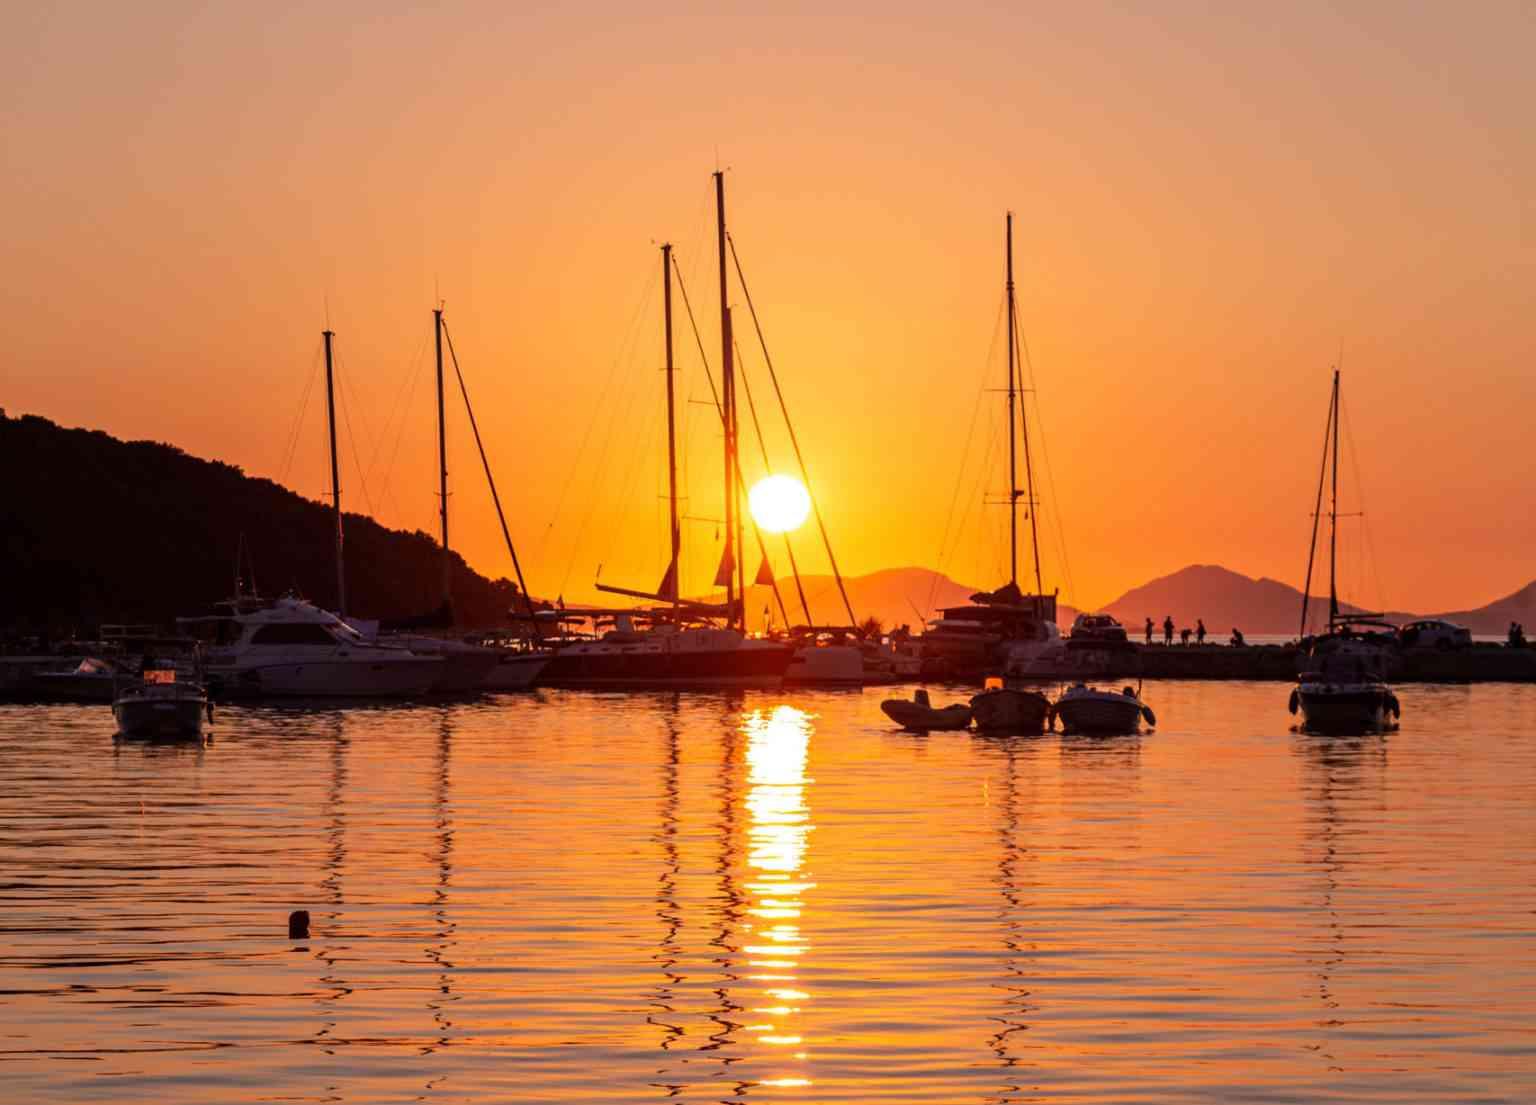 Sunset in Paxoi